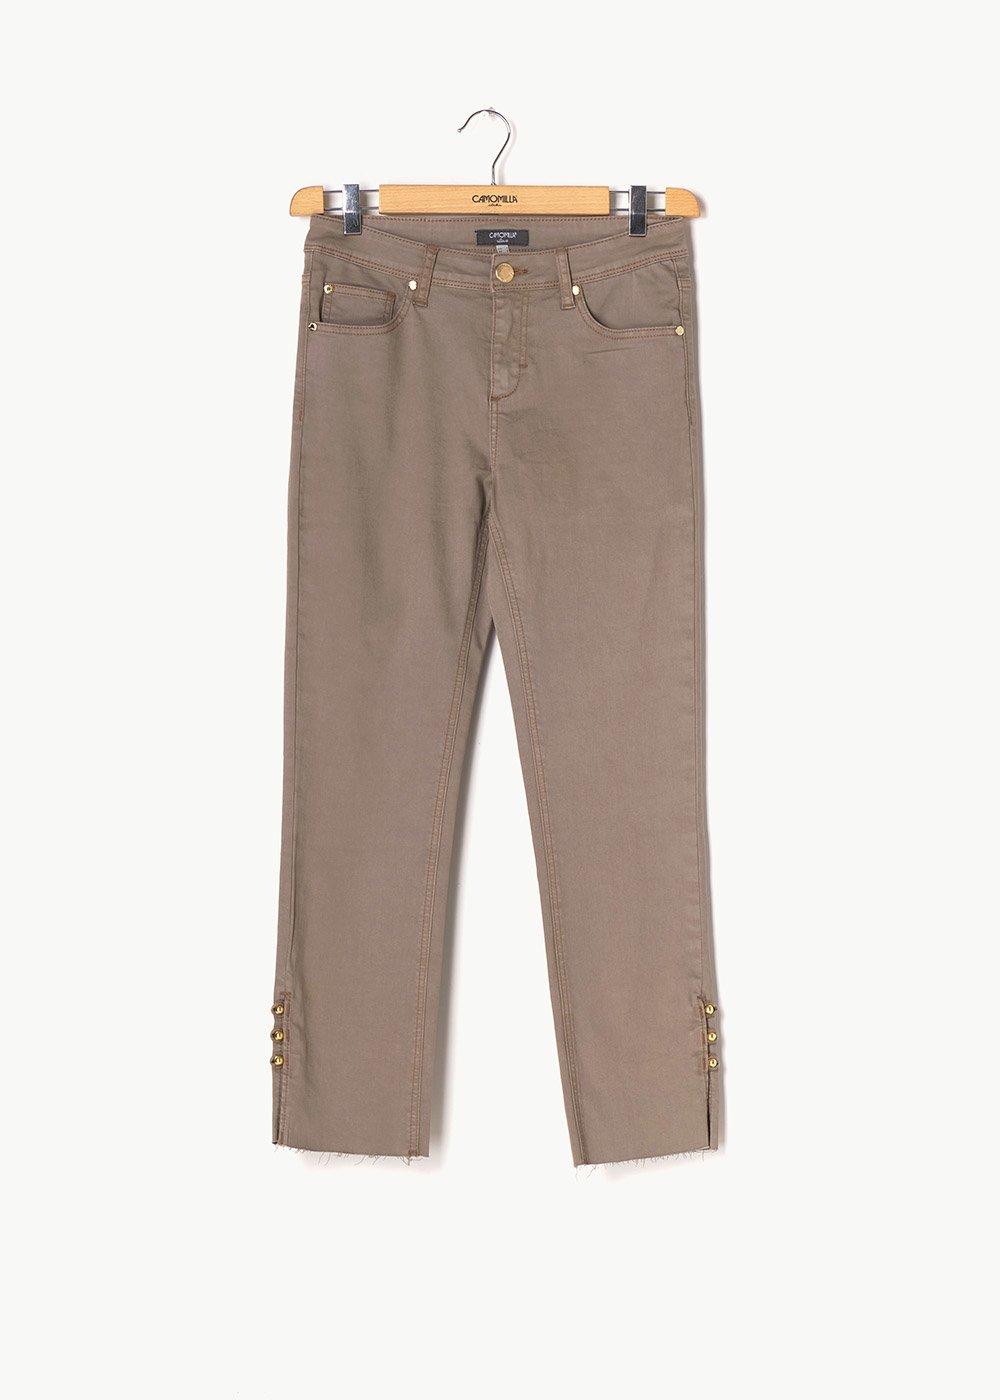 Piero capri pants with details at the bottom - Beige - Woman